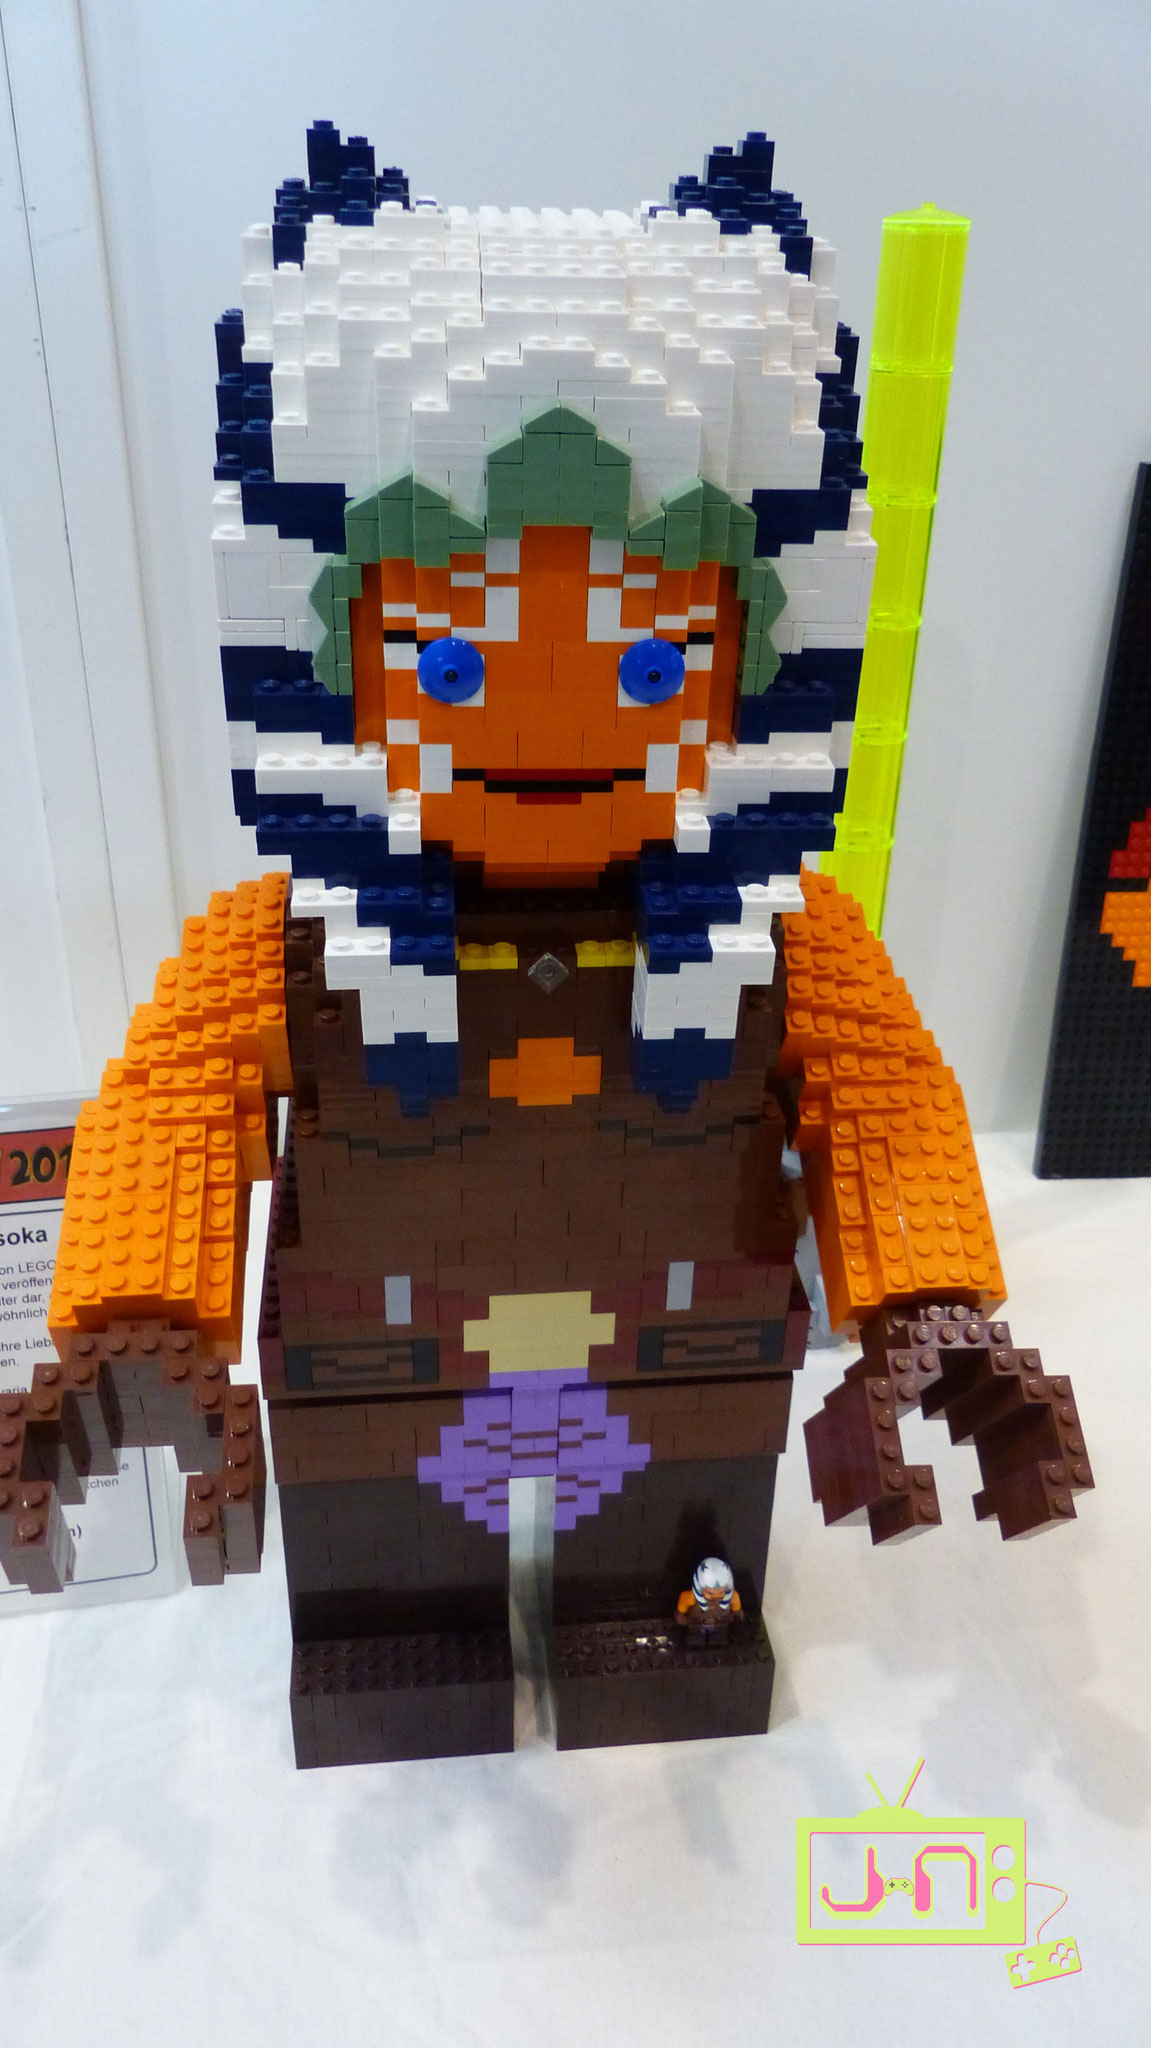 Lego-Asoka aus Lego...voll Inception